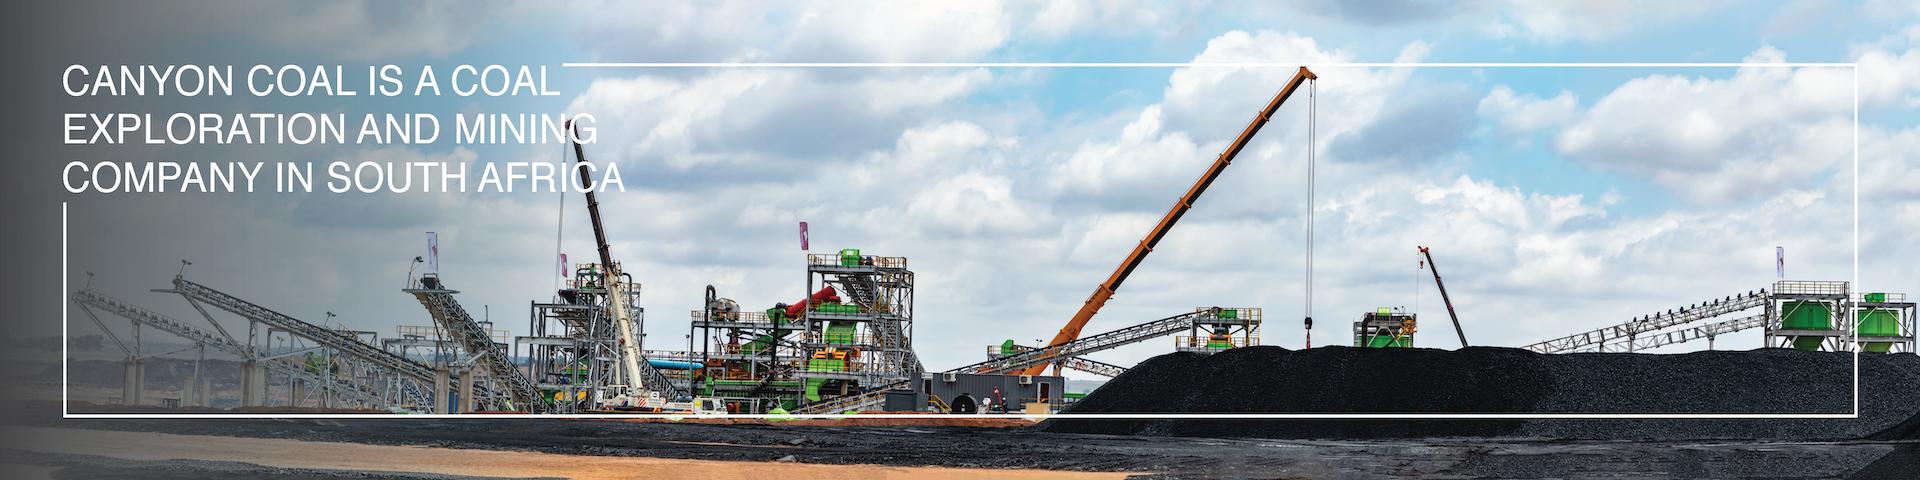 CNY_website_home banners_2019_MiningCompanyLatest.png